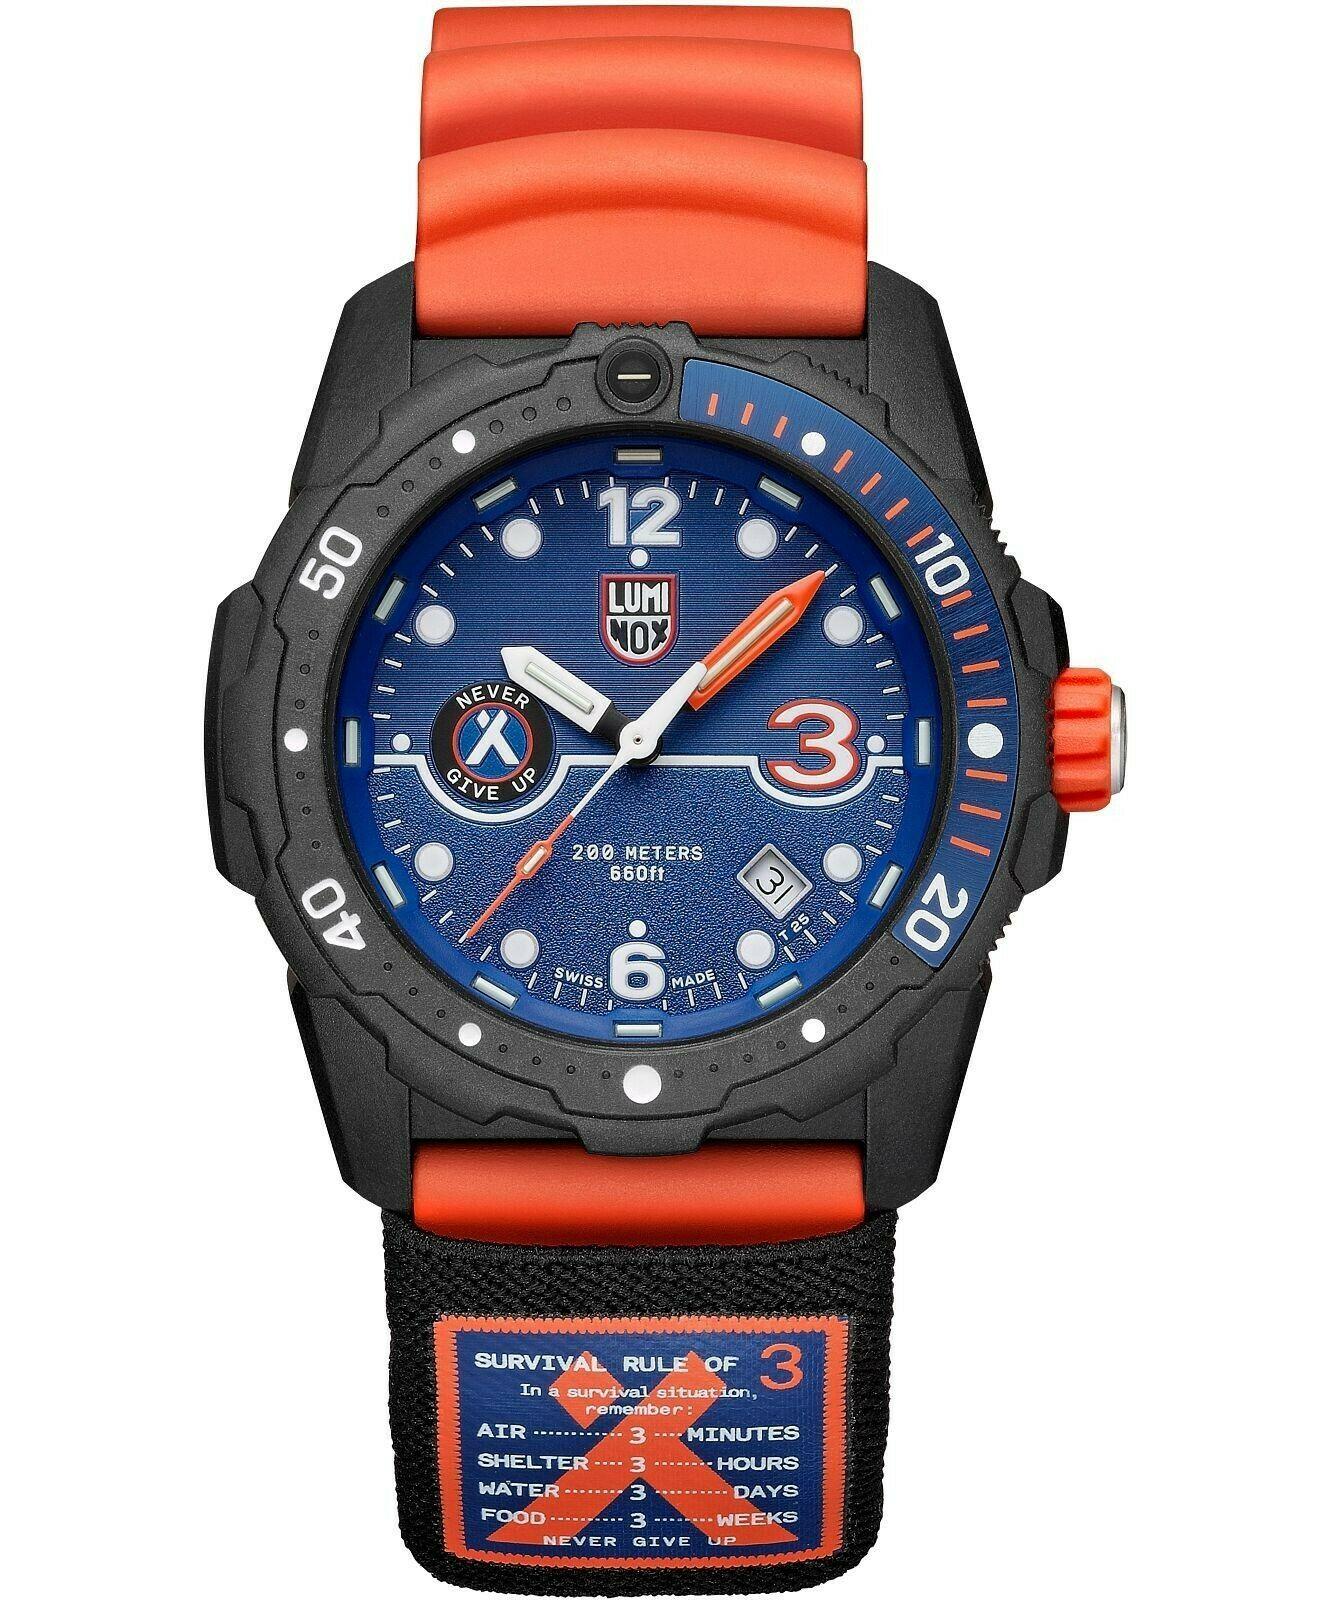 Luminox Bear Grylls Survival Watch, CARBONOX™, Blue, 42 mm, 20 atm, XB.3723.R3